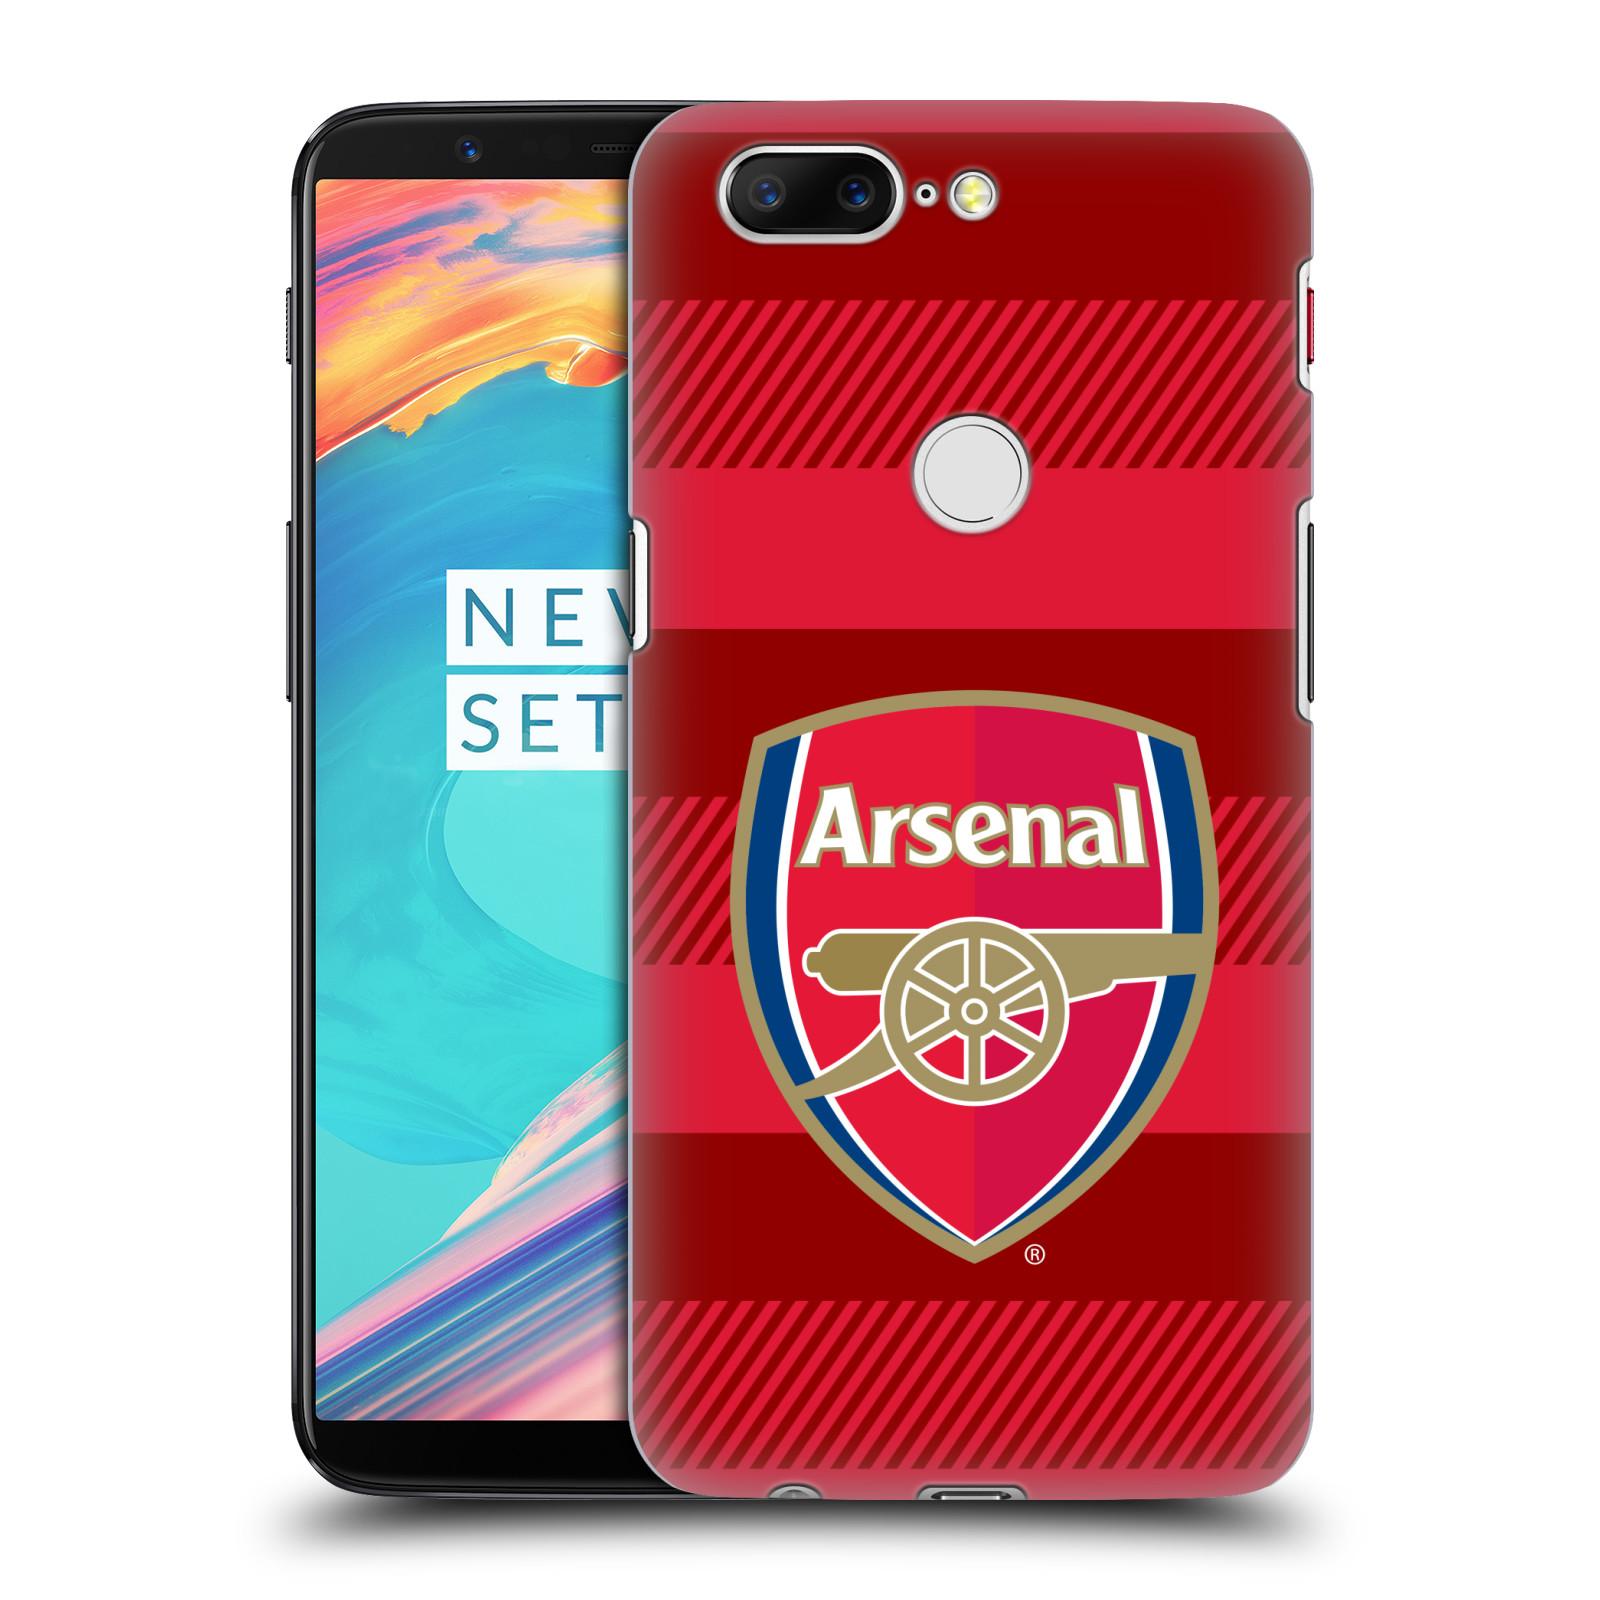 Plastové pouzdro na mobil OnePlus 5T - Head Case - Arsenal FC - Logo s pruhy